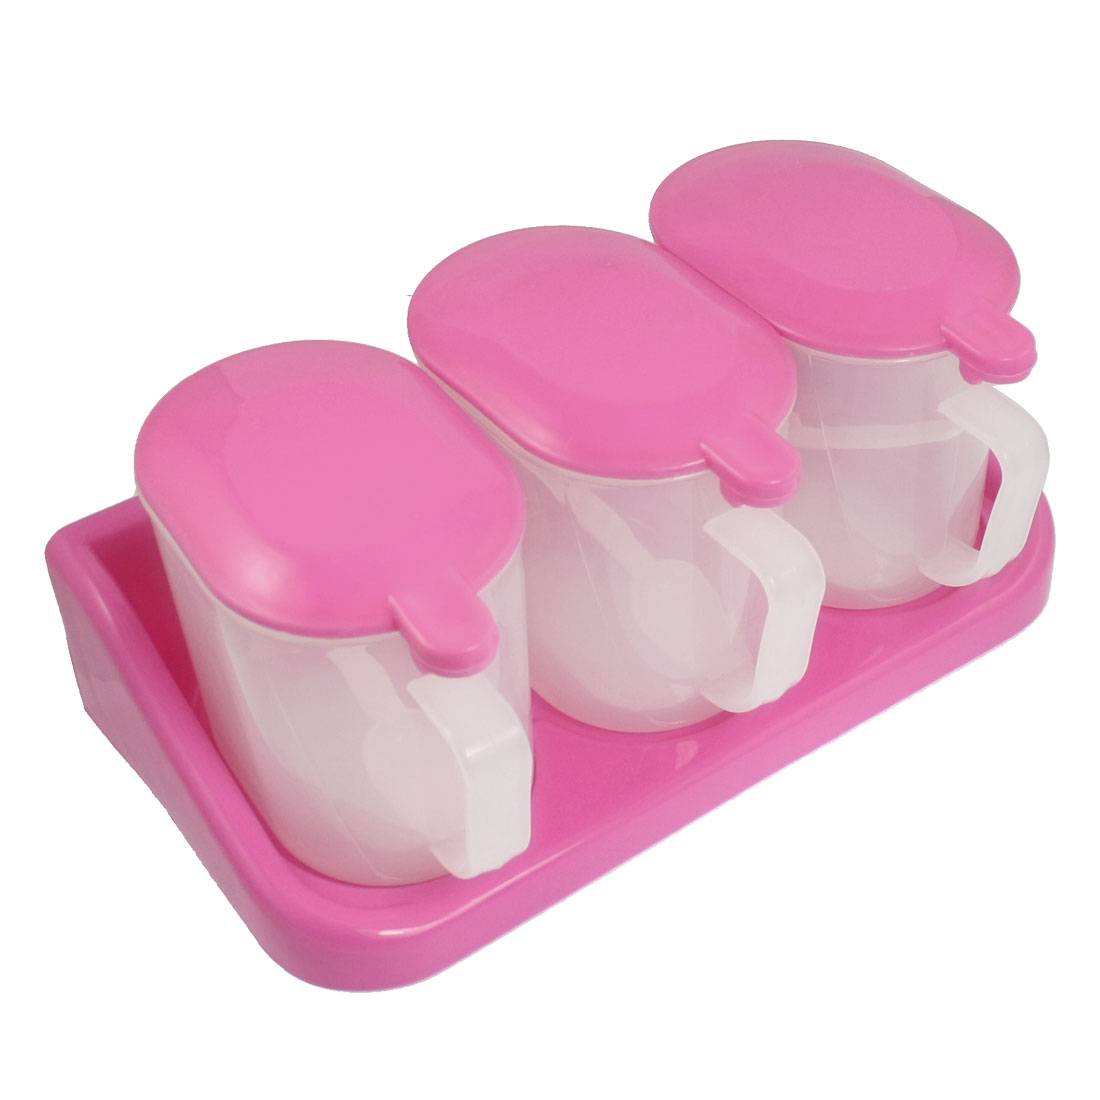 Kitchen Plastic 3 Case Spices Sugar Box Container Holder Fuchsia w Spoons